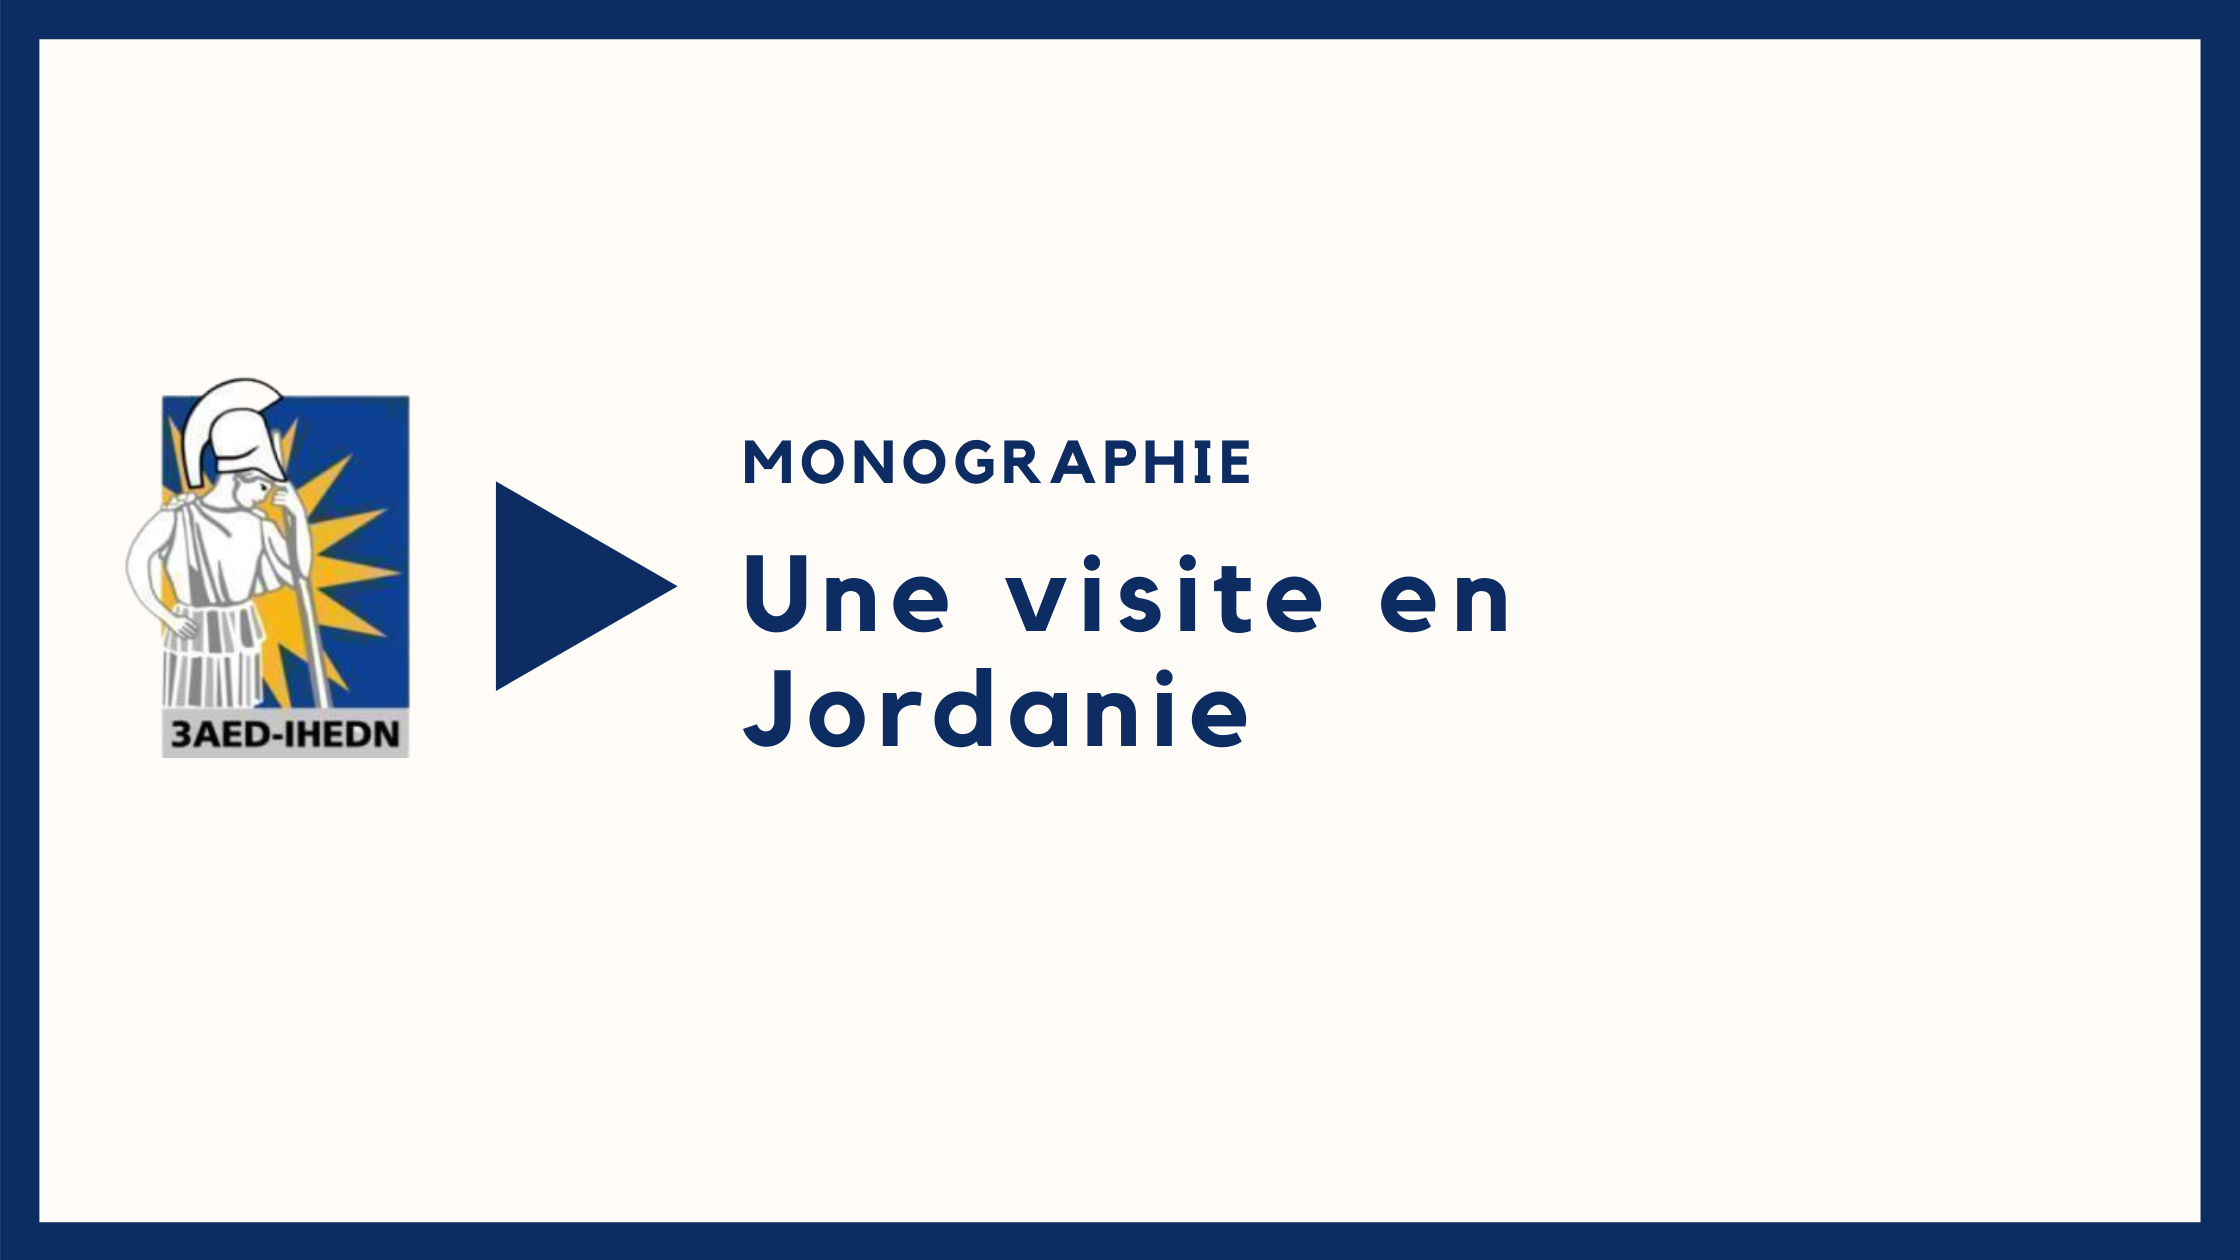 Monographie   Une visite en Jordanie